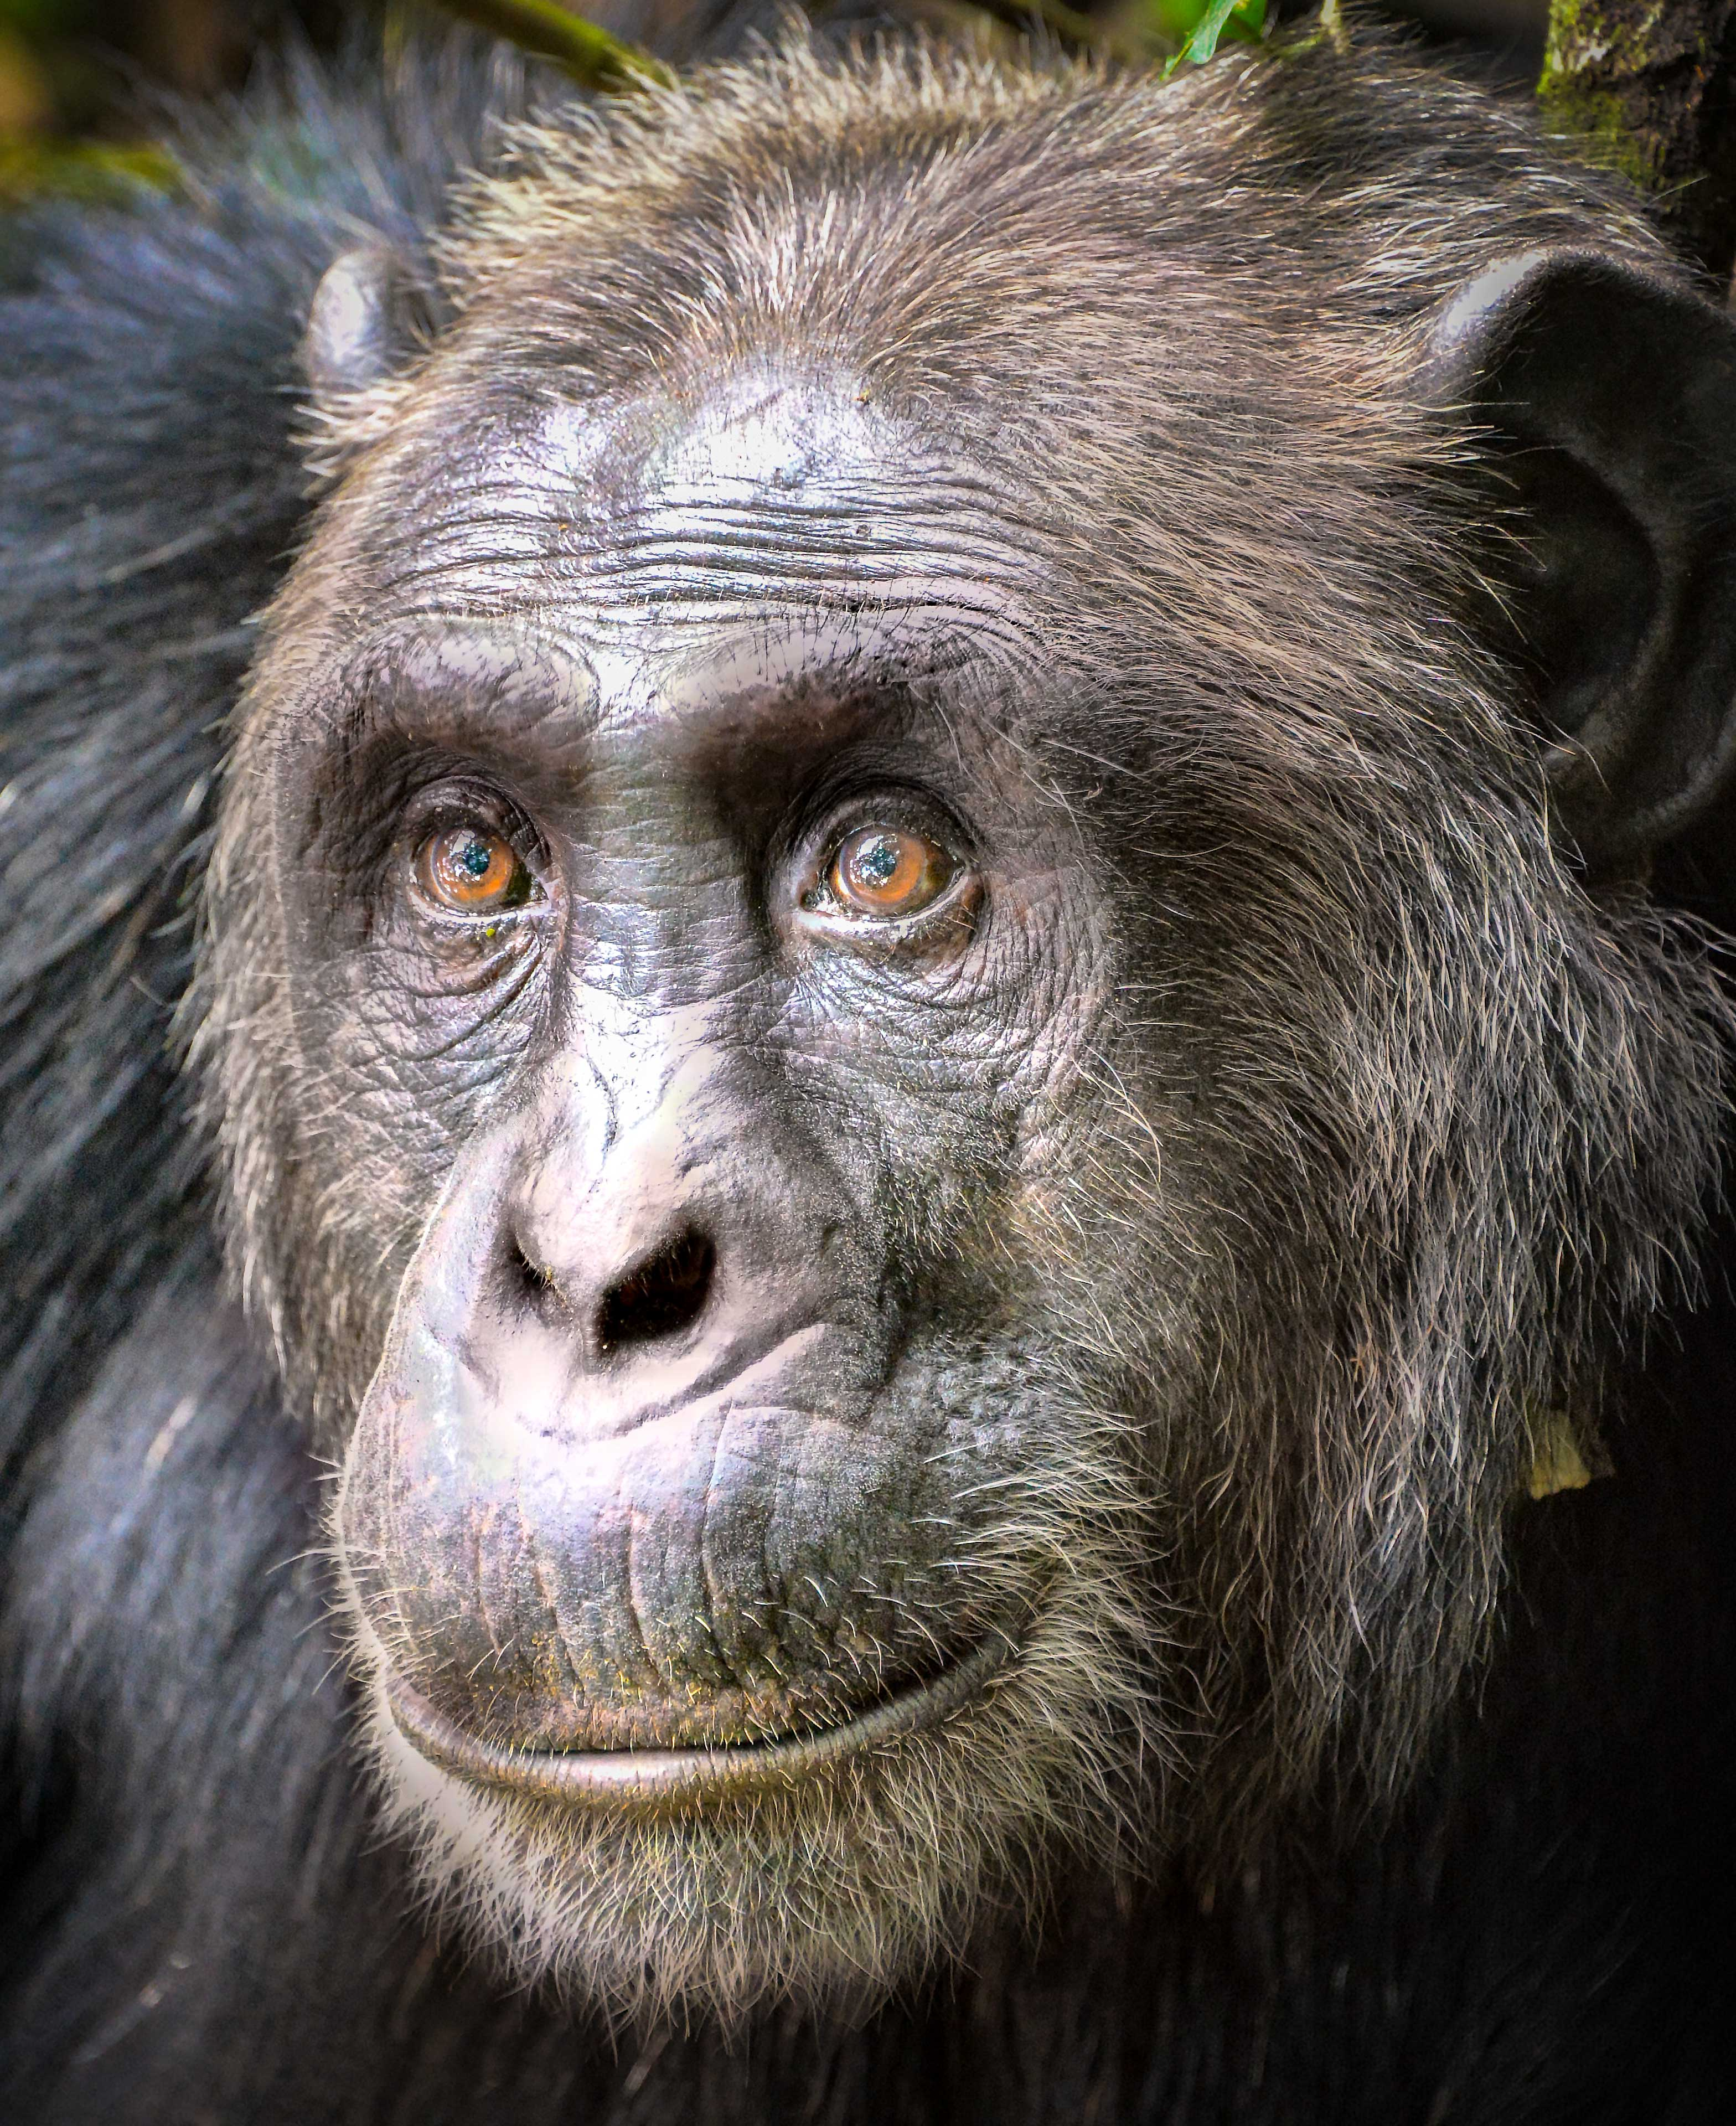 Chimpanzee,_Kibale,_Uganda_(23022998774)